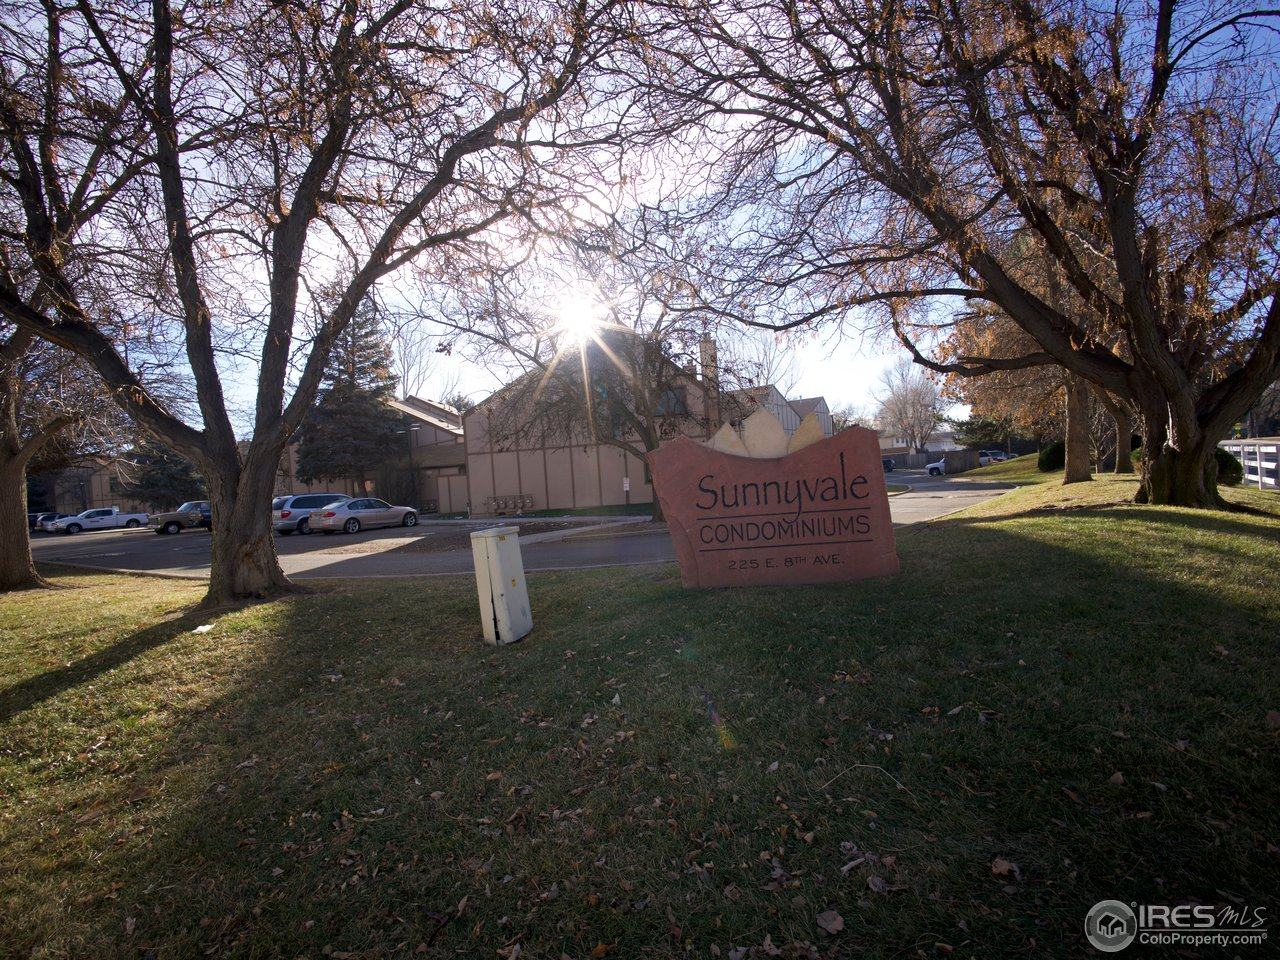 225 E 8th Ave F14, Longmont CO 80504